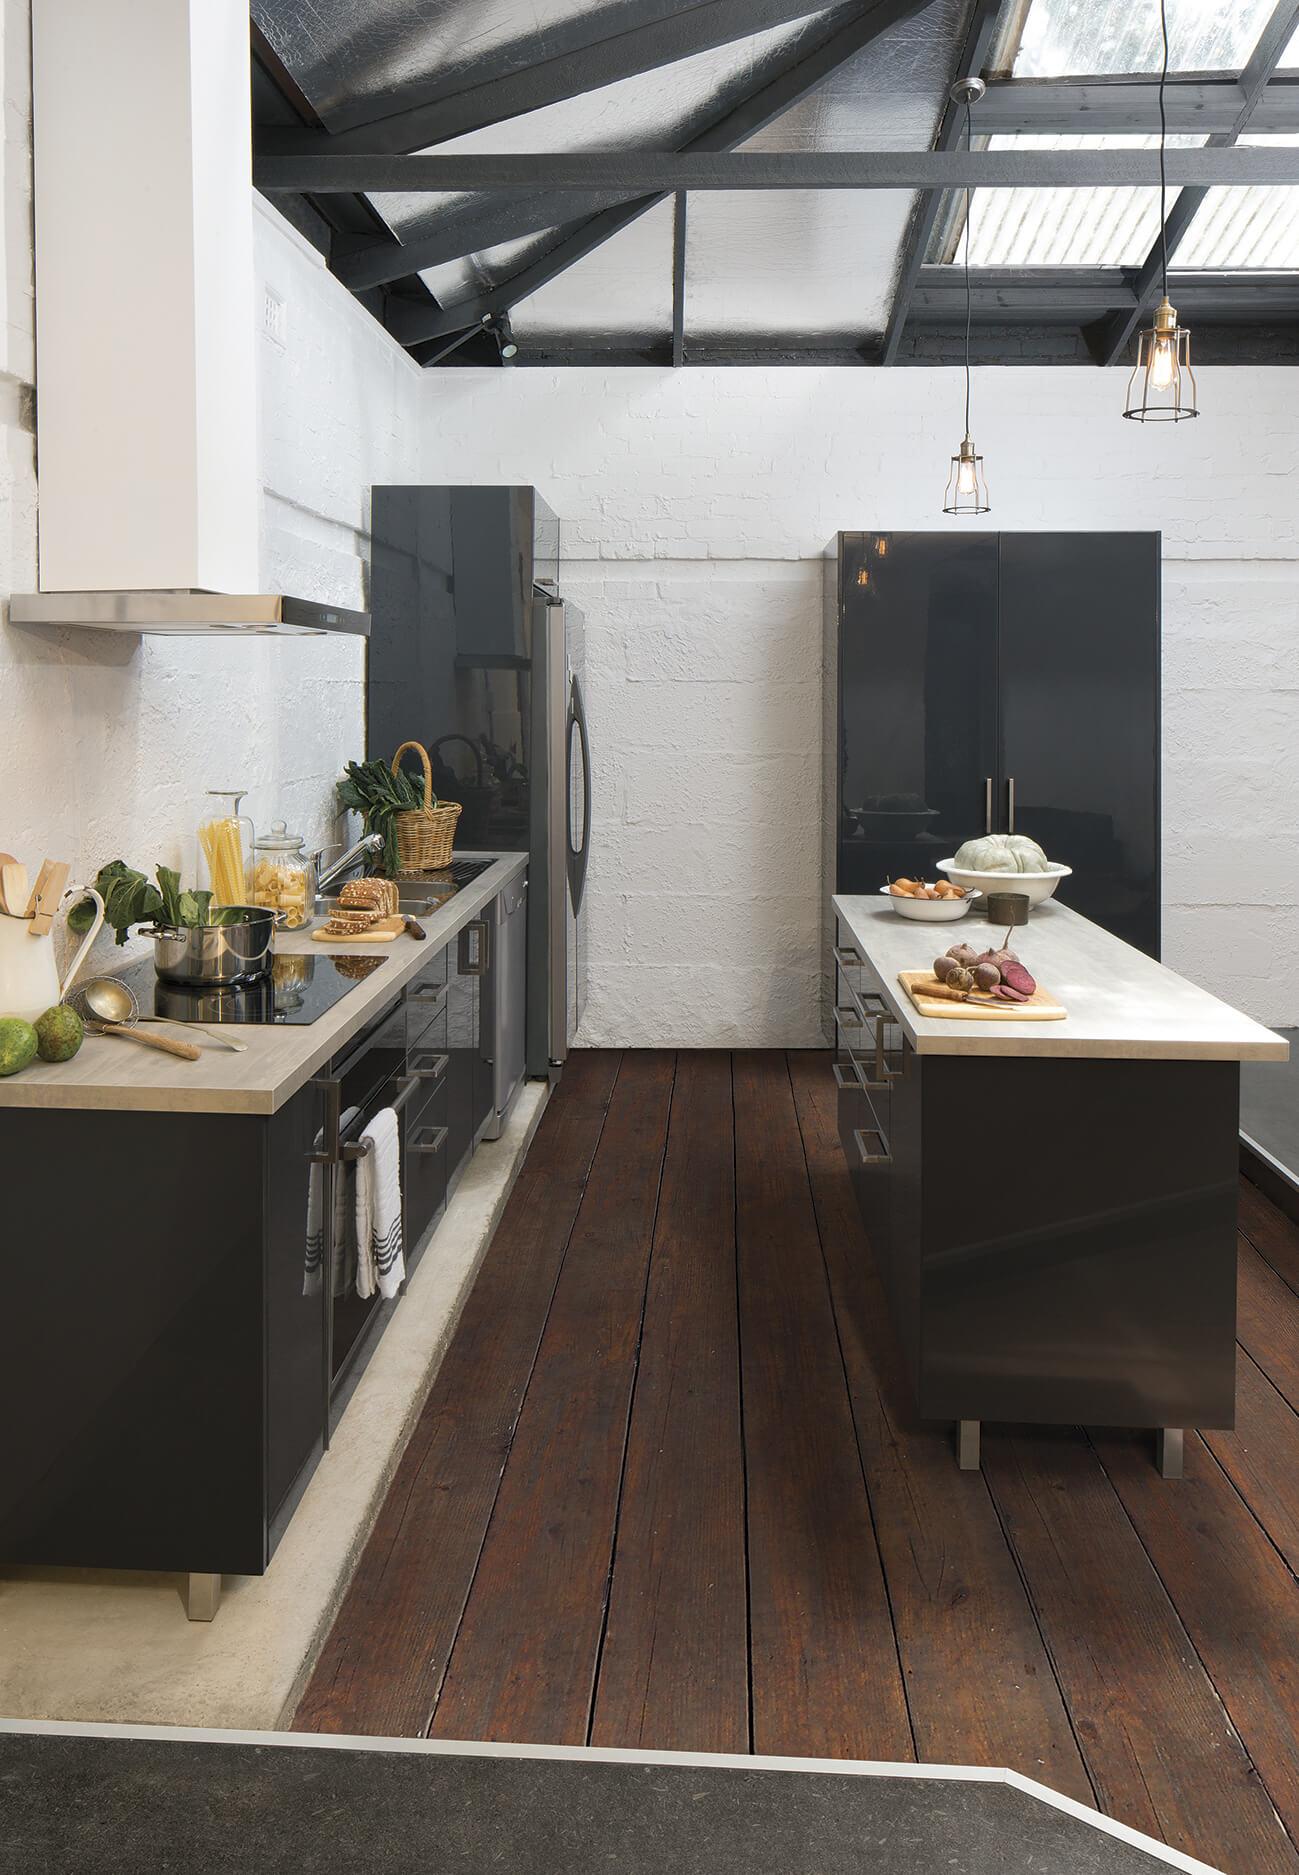 furniture warehouse cabi medium kitchen surplus builders of vanity cabinets size sink unfinished bathroom